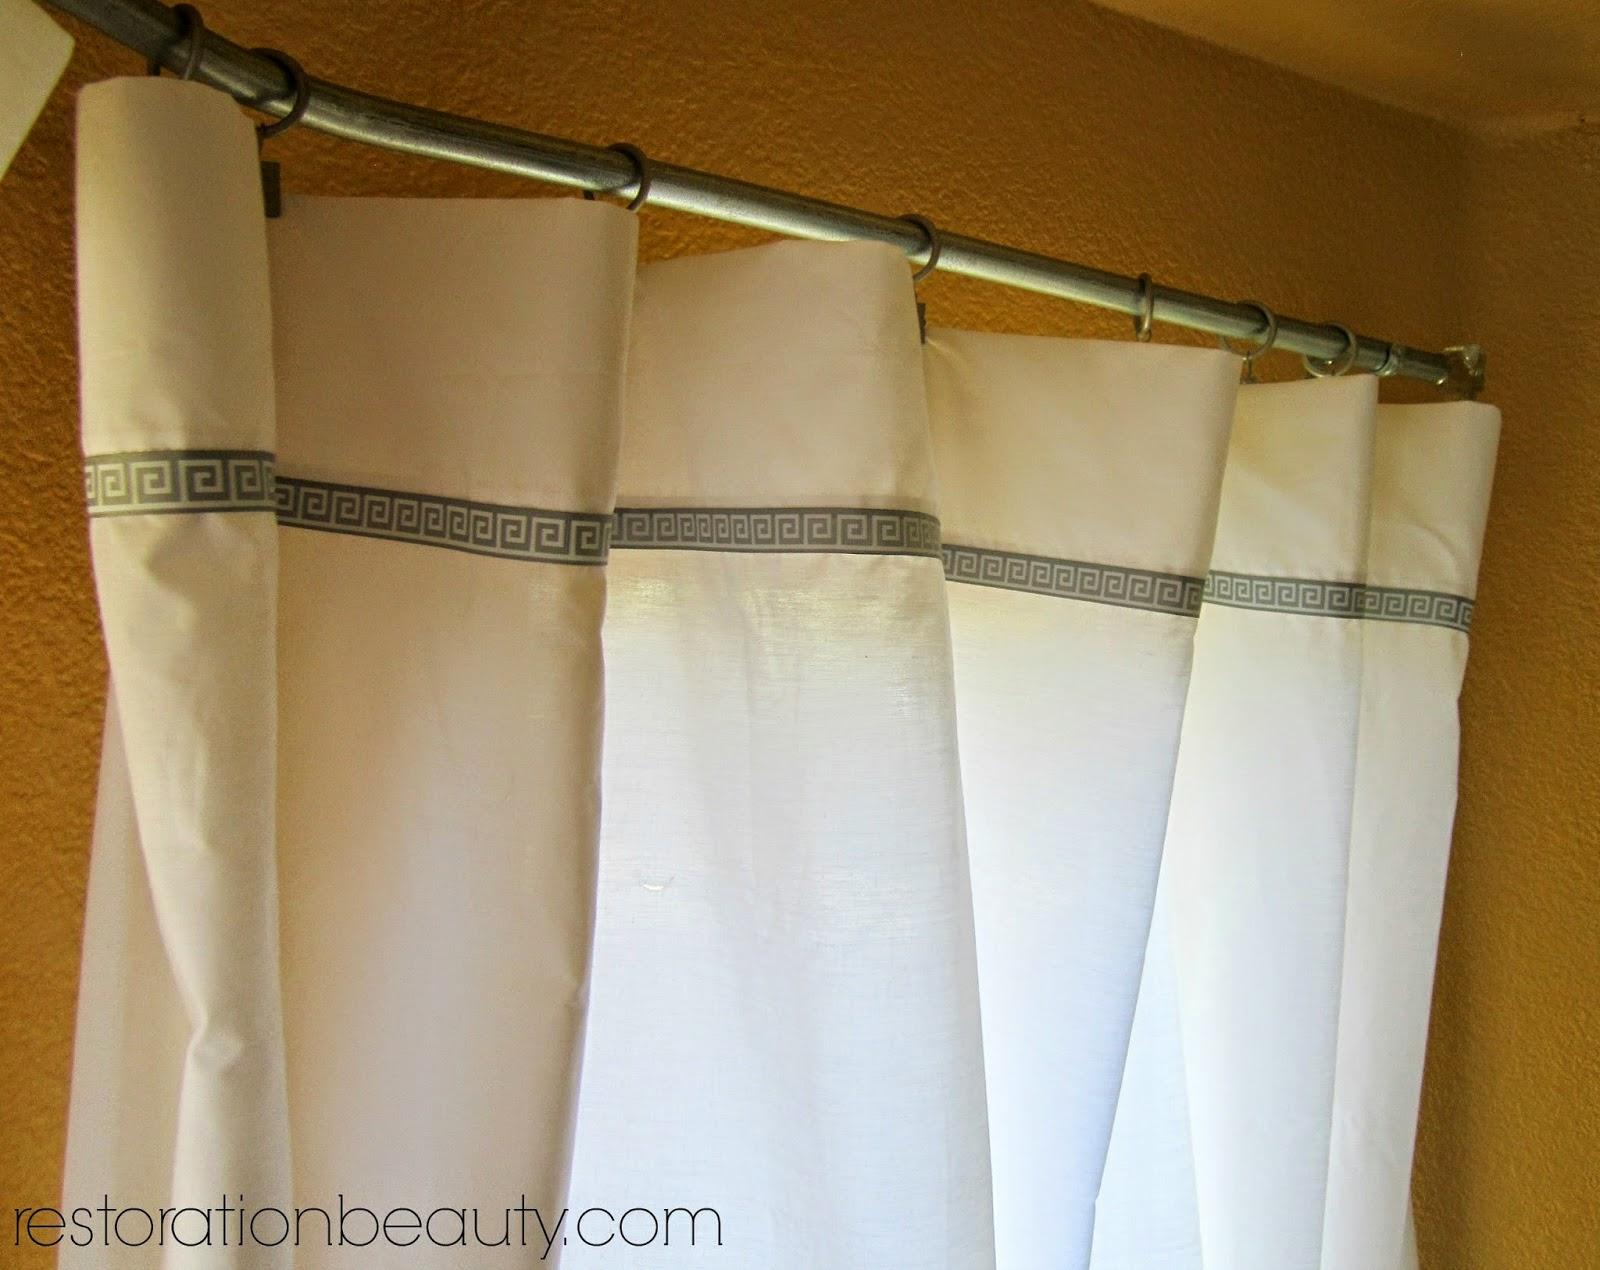 Restoration Beauty Conduit Pipe Bay Window Curtain Rod Bed